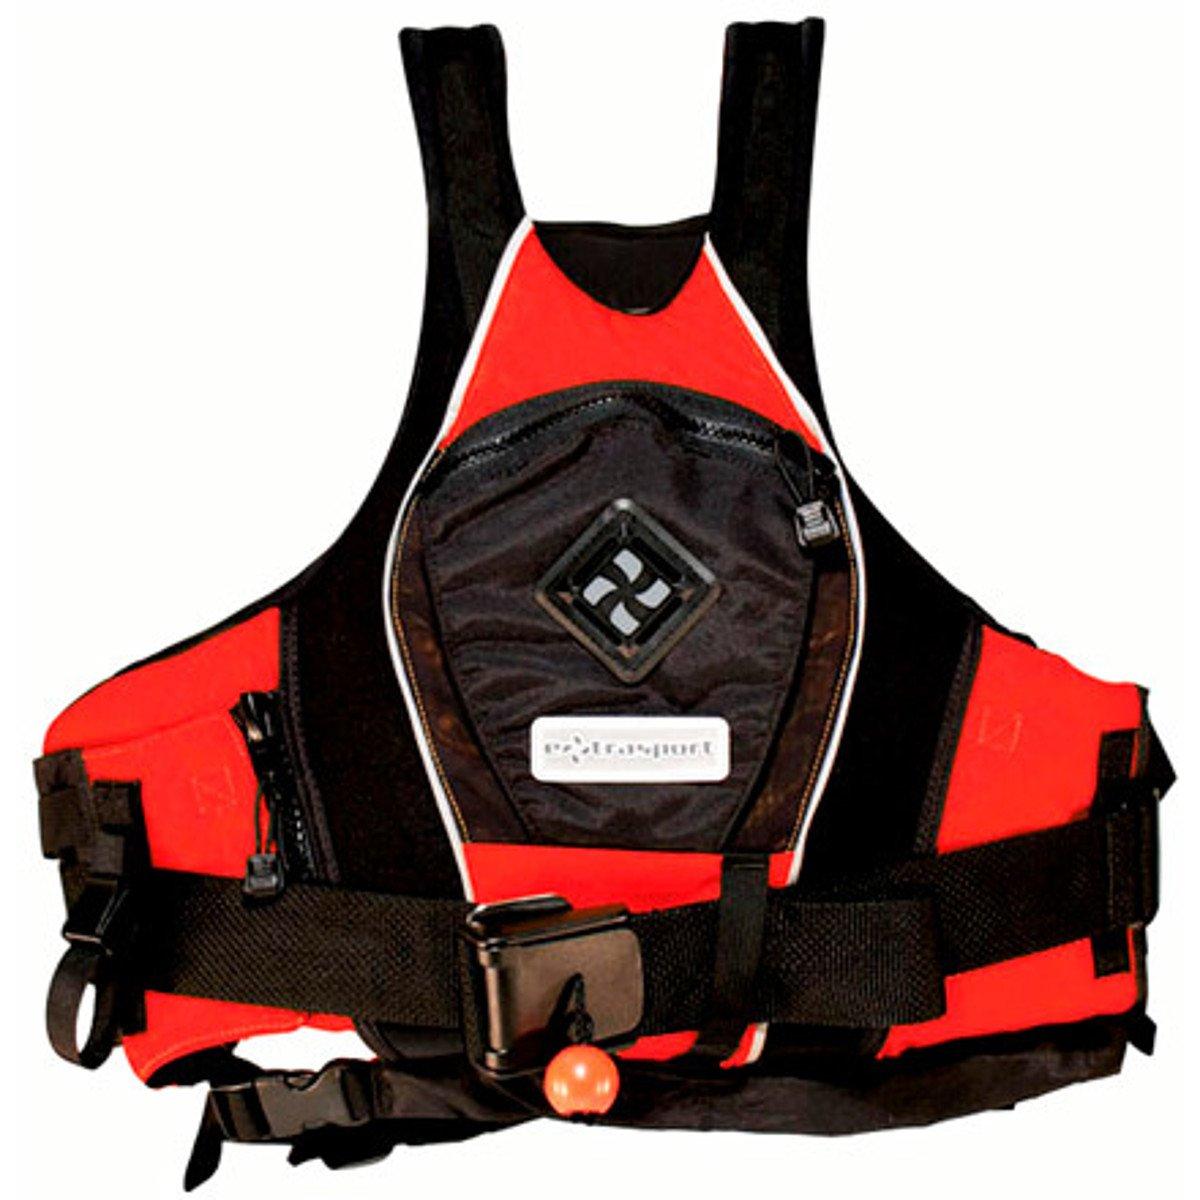 Extrasport B003O2BLRM Pro Creeker個人Flotation XS Device XS レッド Device/ブラック B003O2BLRM, ナカガワチョウ:d41bf05d --- rodebyjakt.se